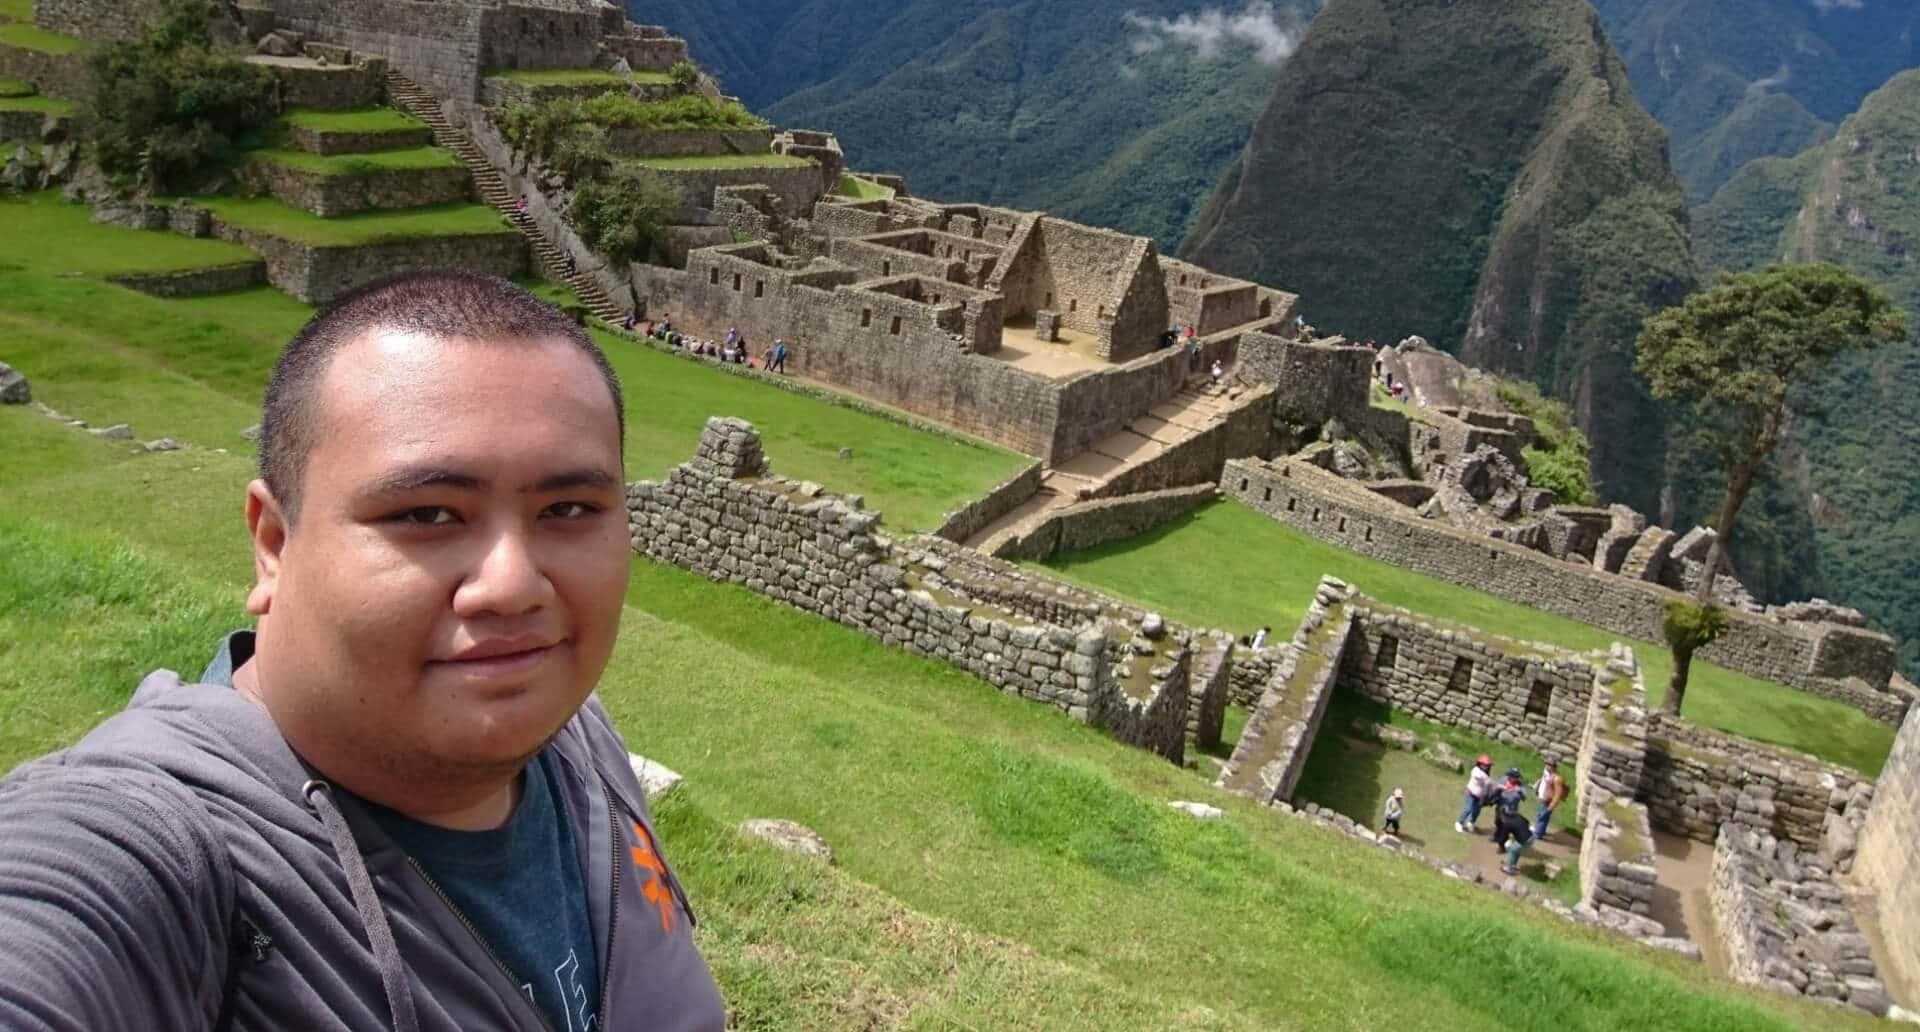 Asad at Machu Picchu